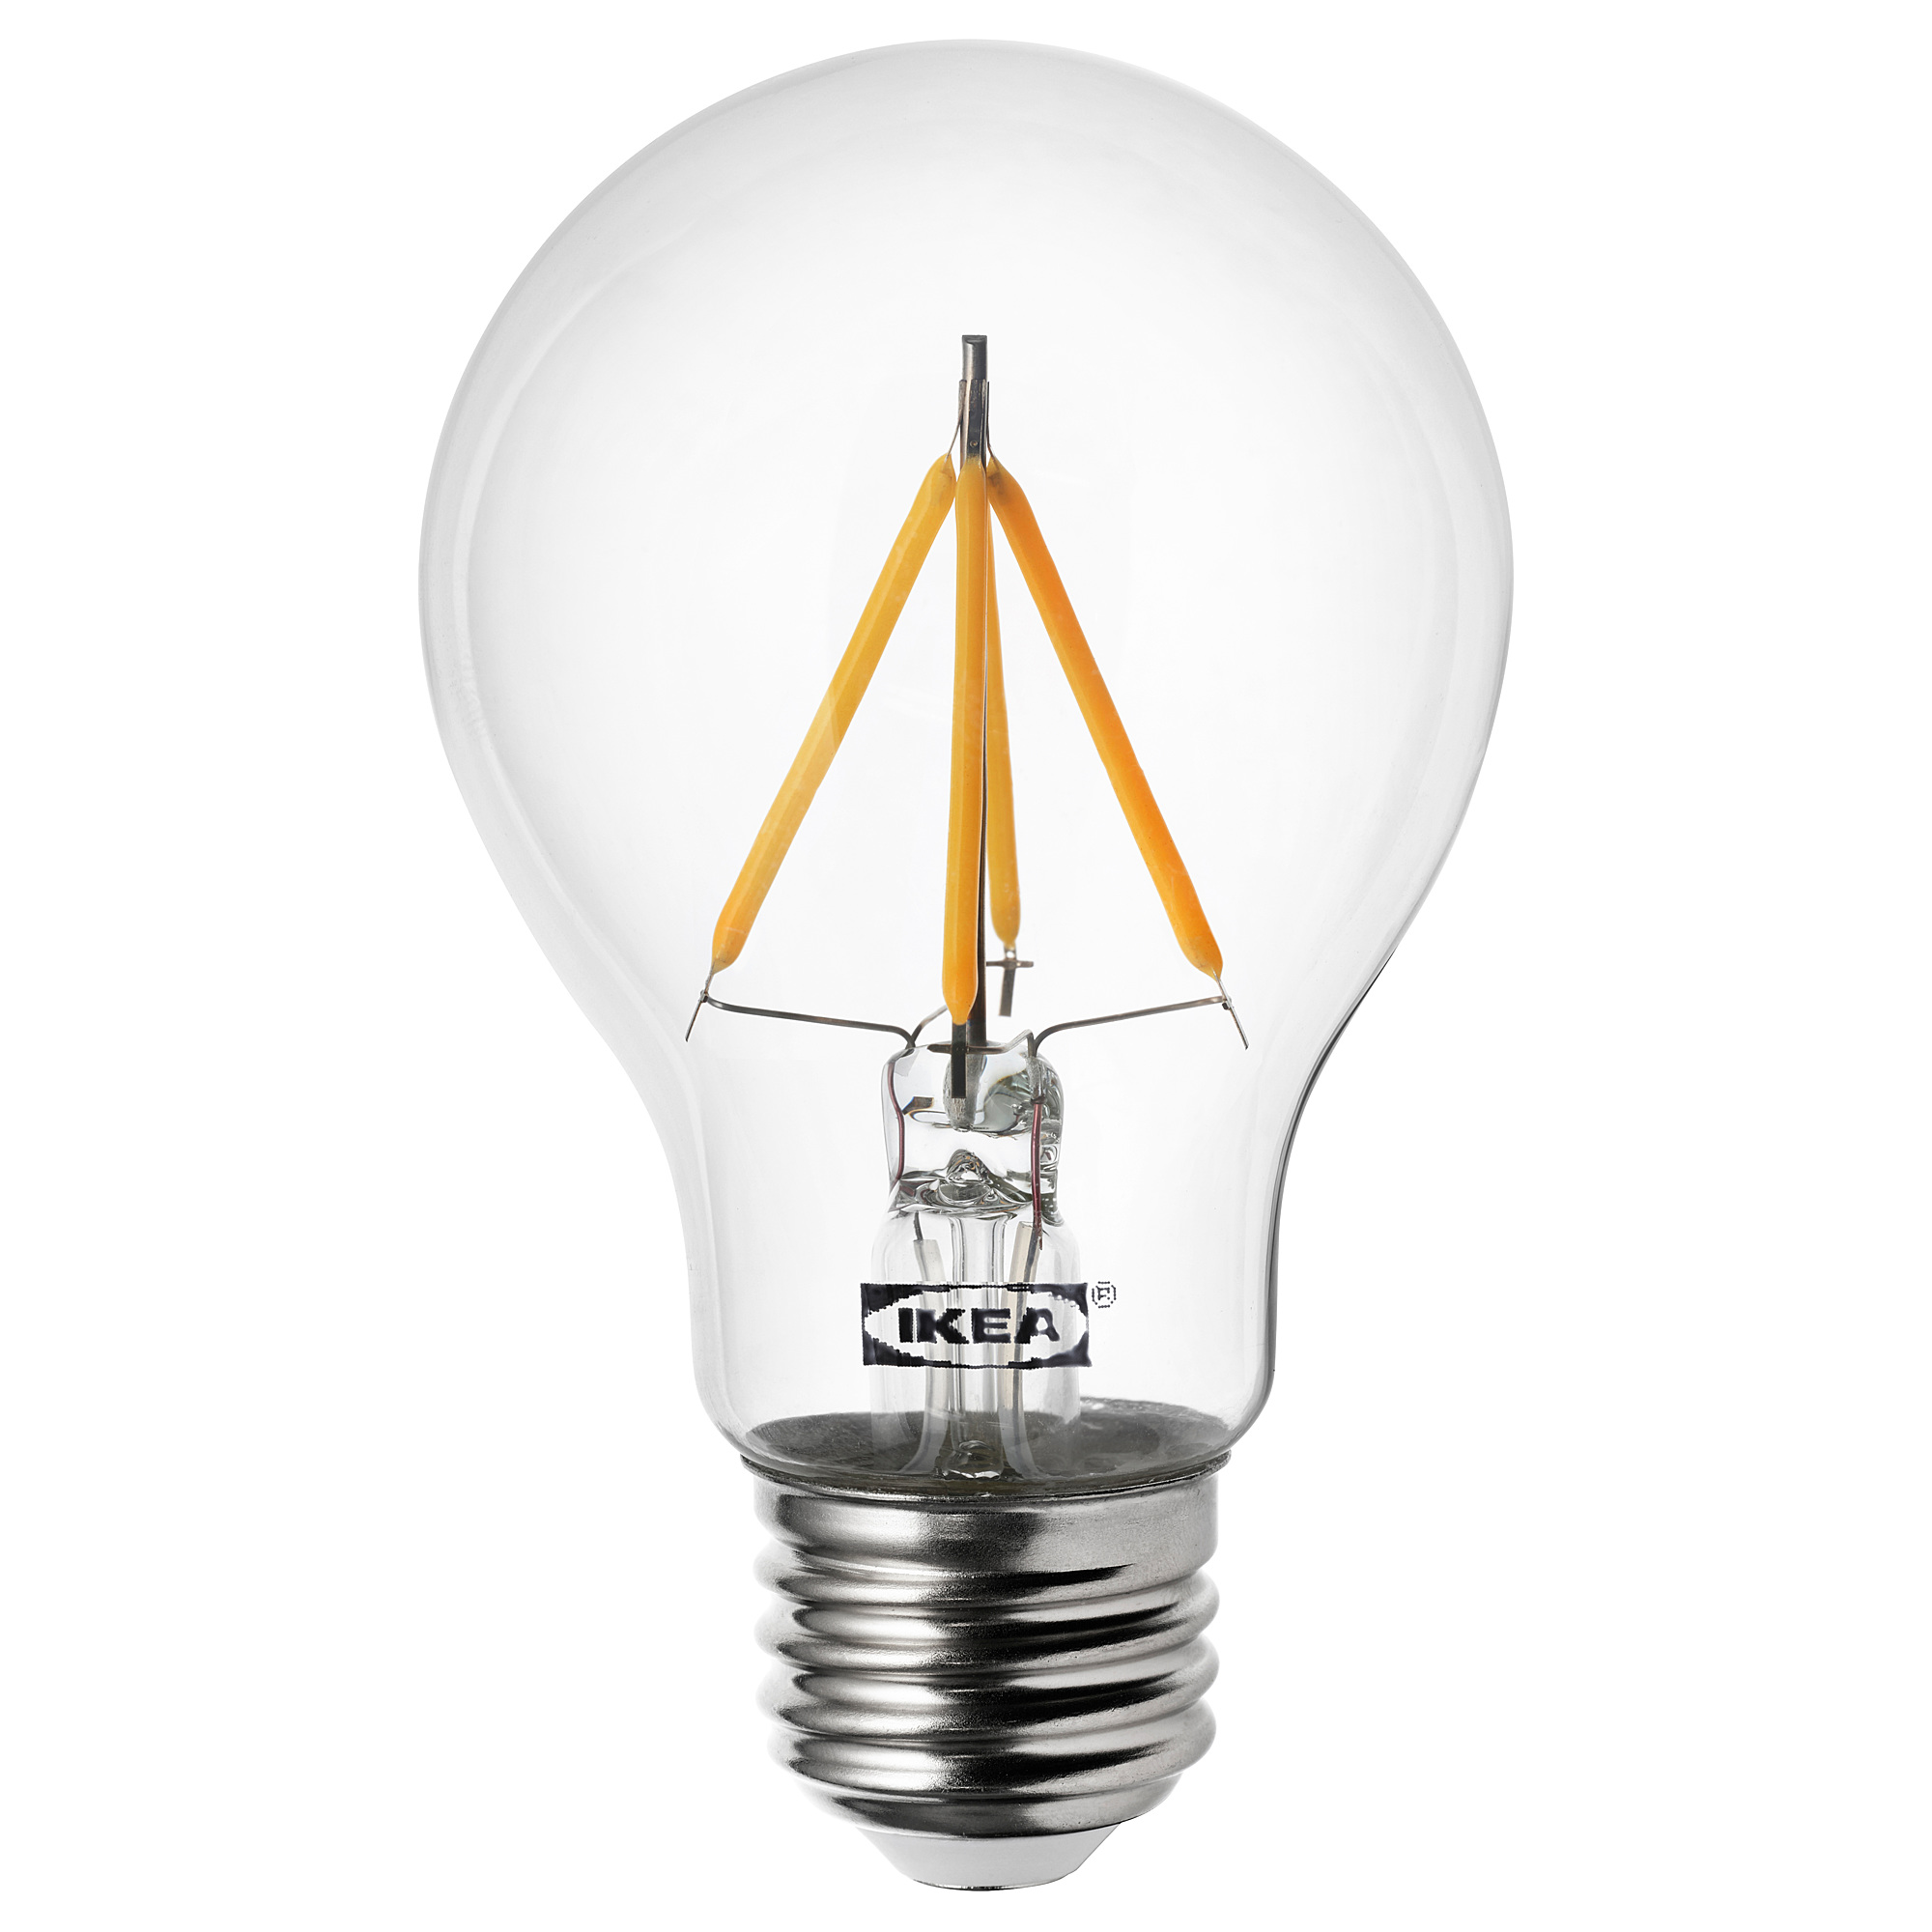 IKEA RYET LED bulb E27 470 lumen globe opal white